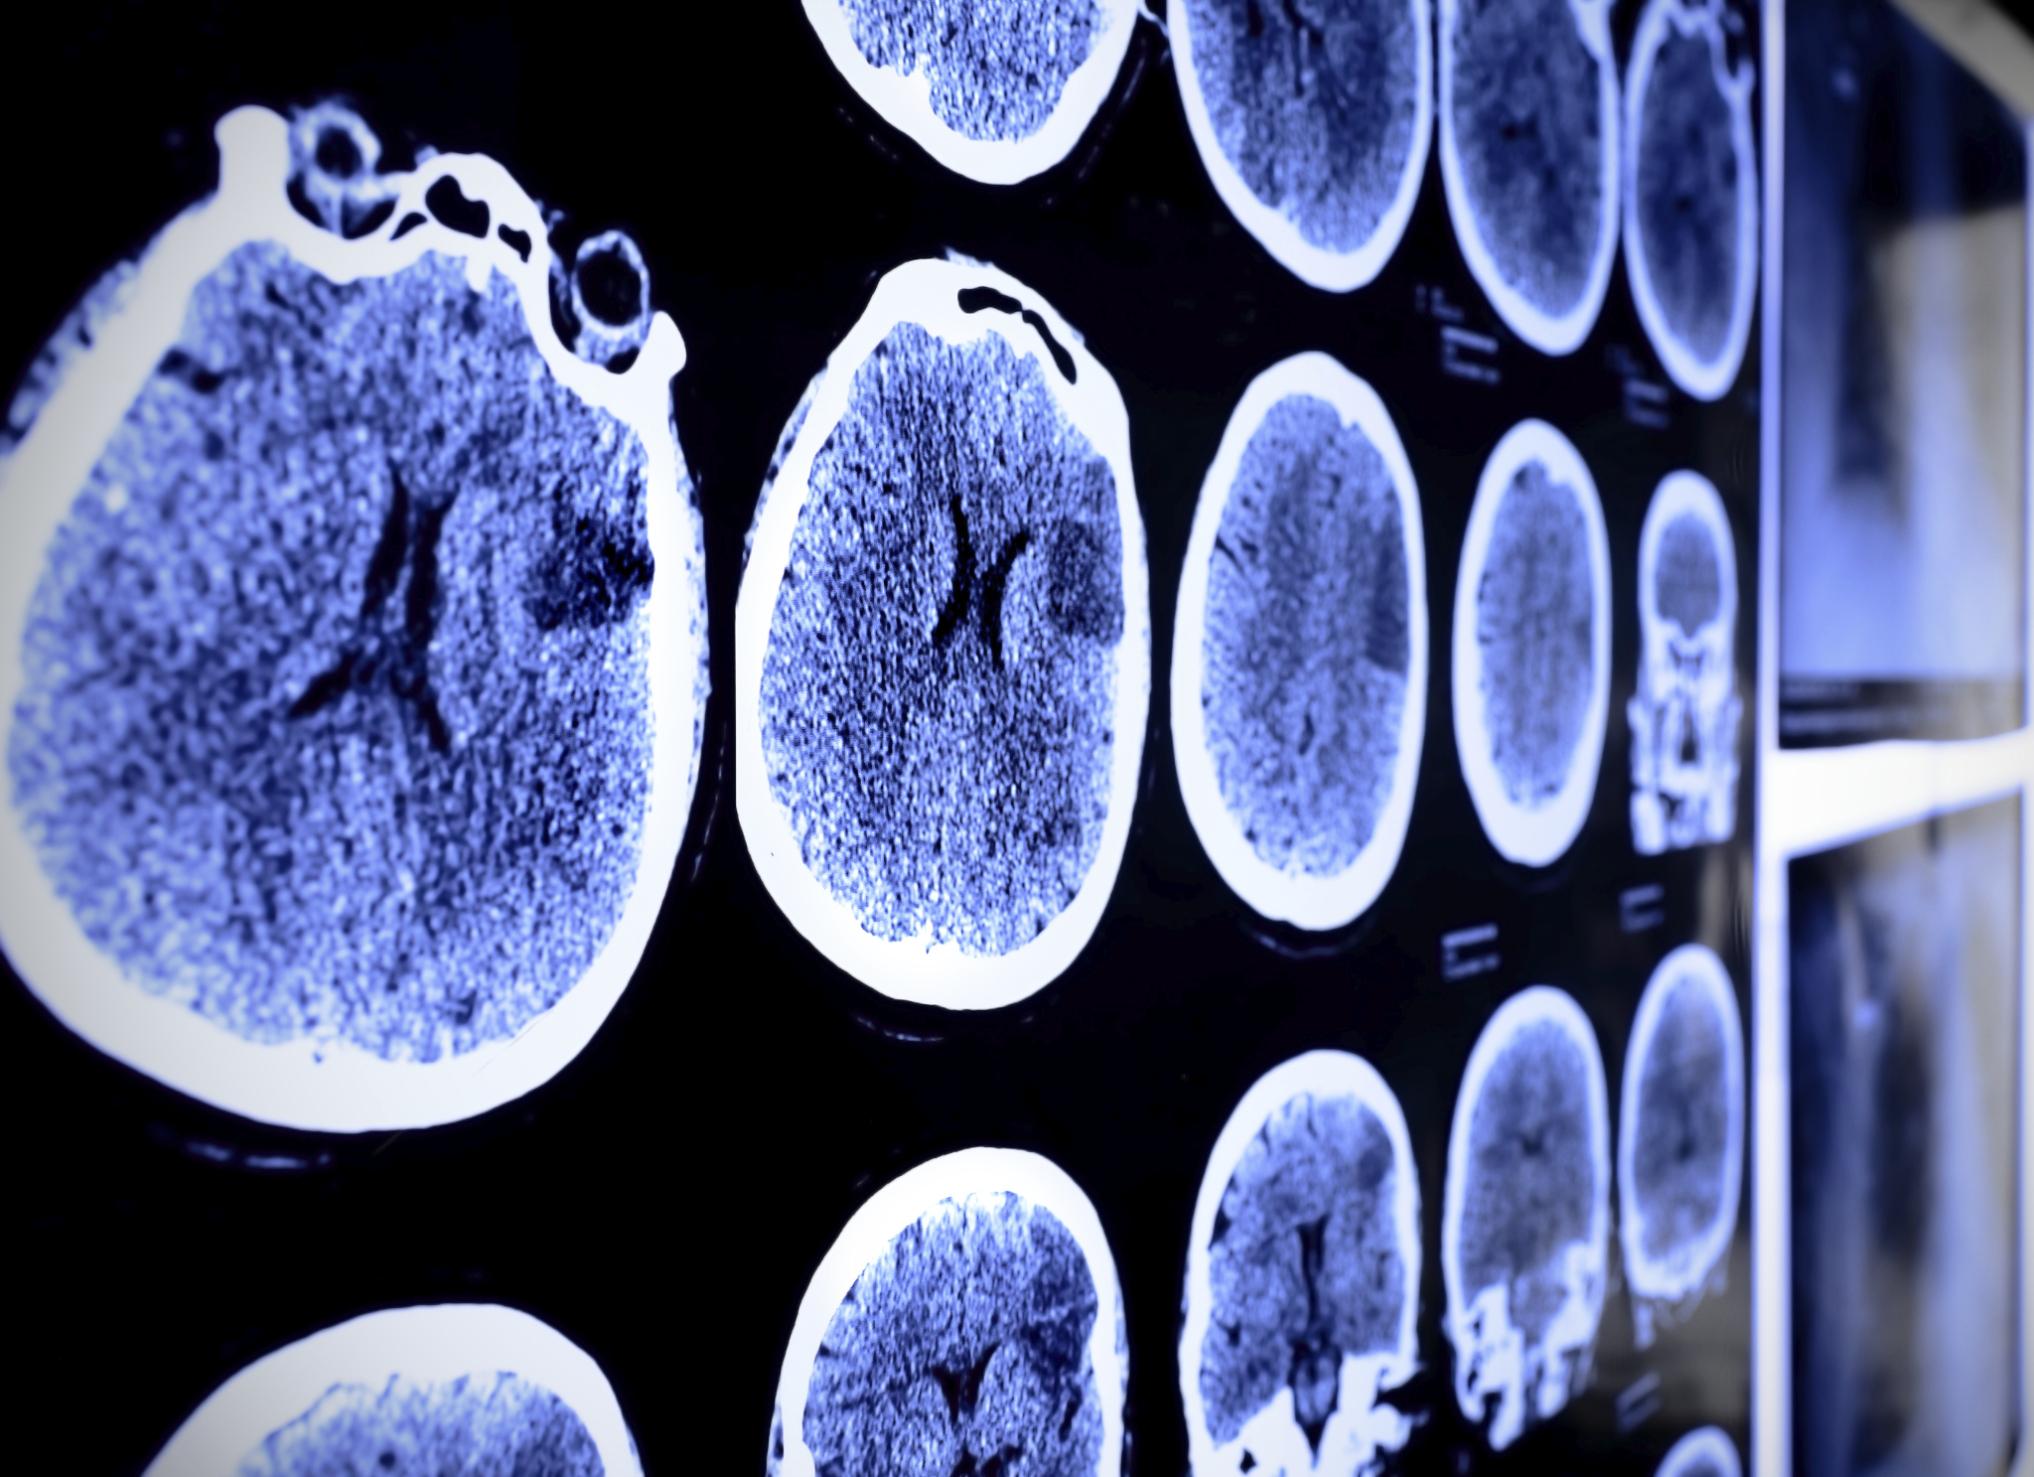 Study: Brain health linked to ability to keep balance